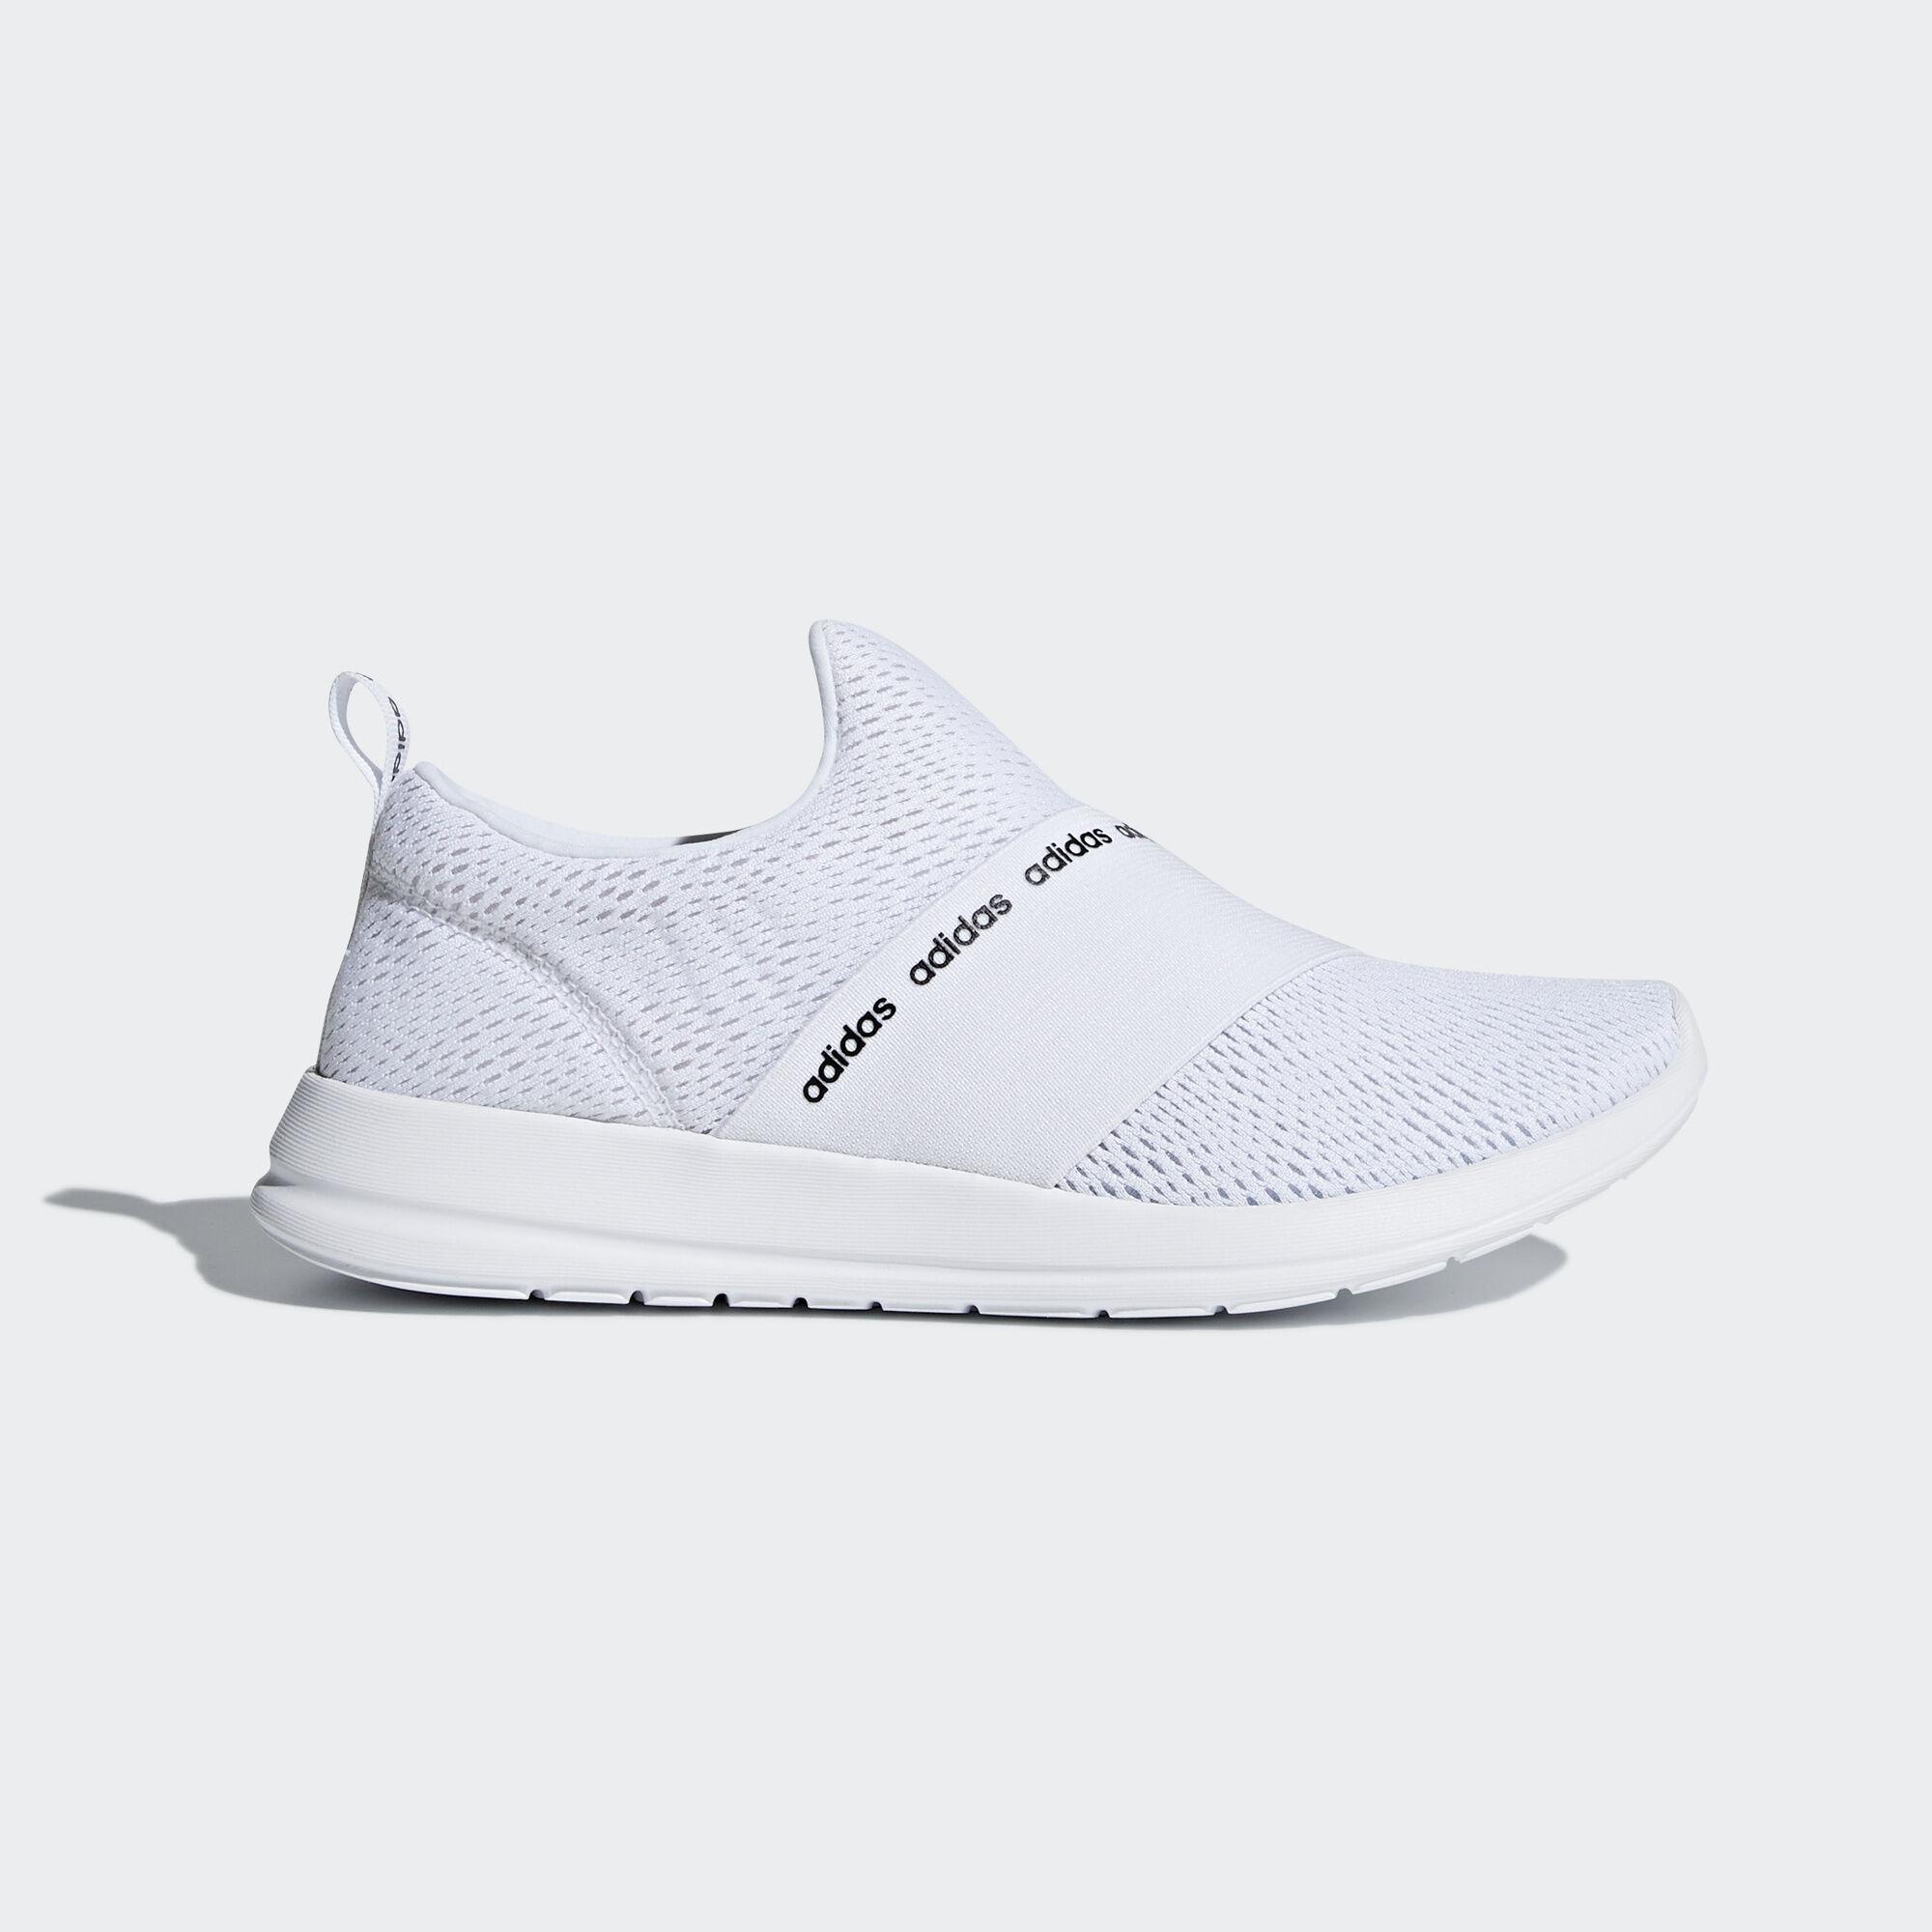 Adidas Cloudfoam Refine Adapt Shoes White Adidas